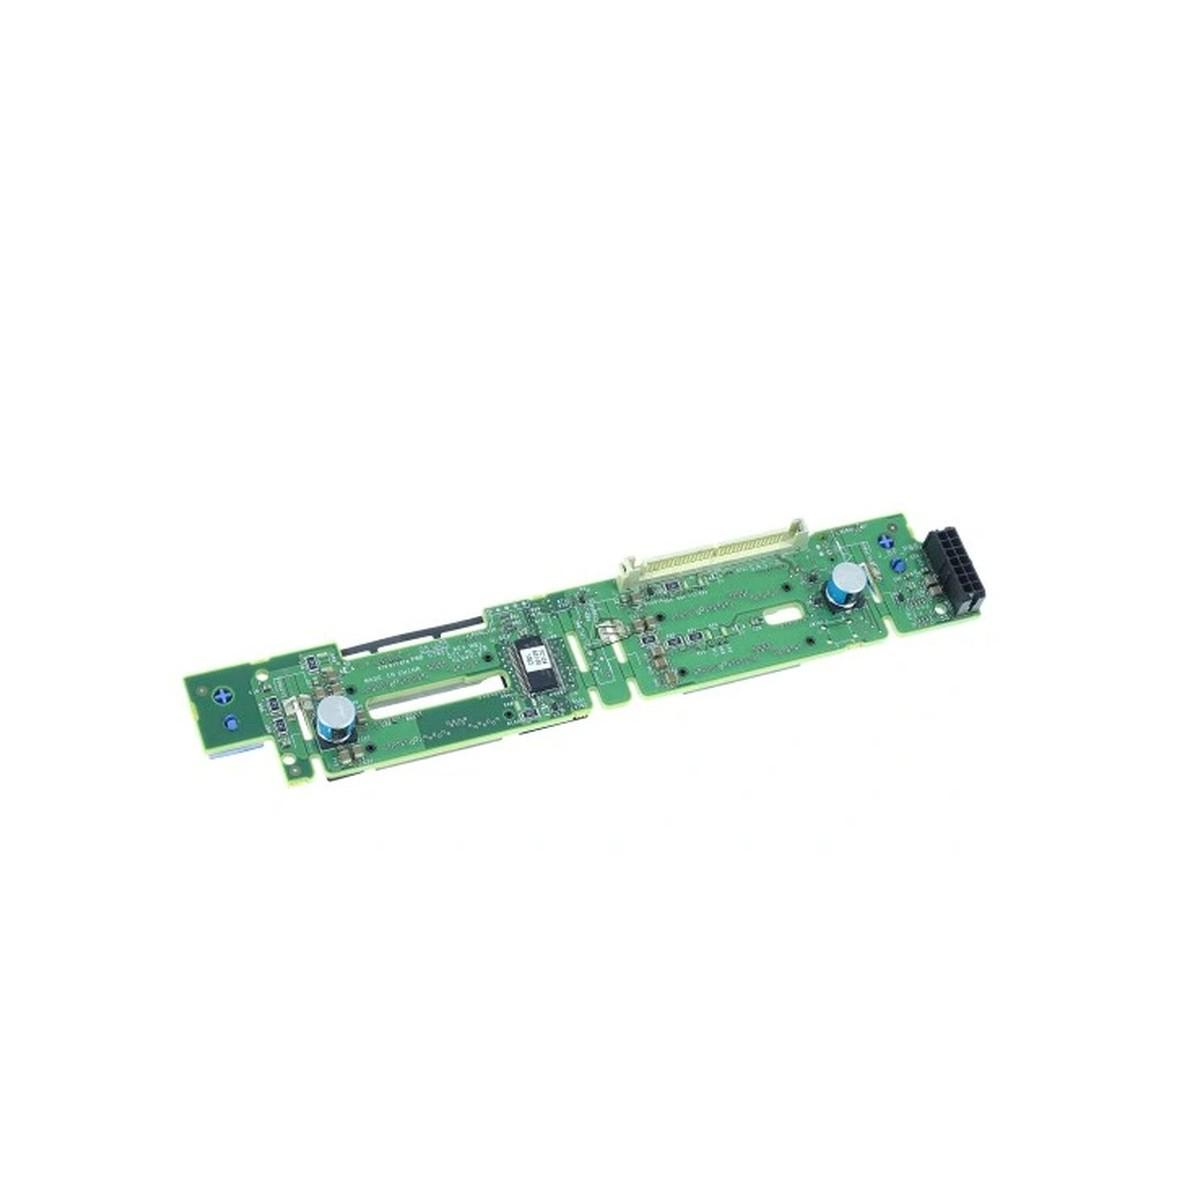 DELL T610 RACK 2.26 QC 24GB 2x300GB SAS 2xPSU